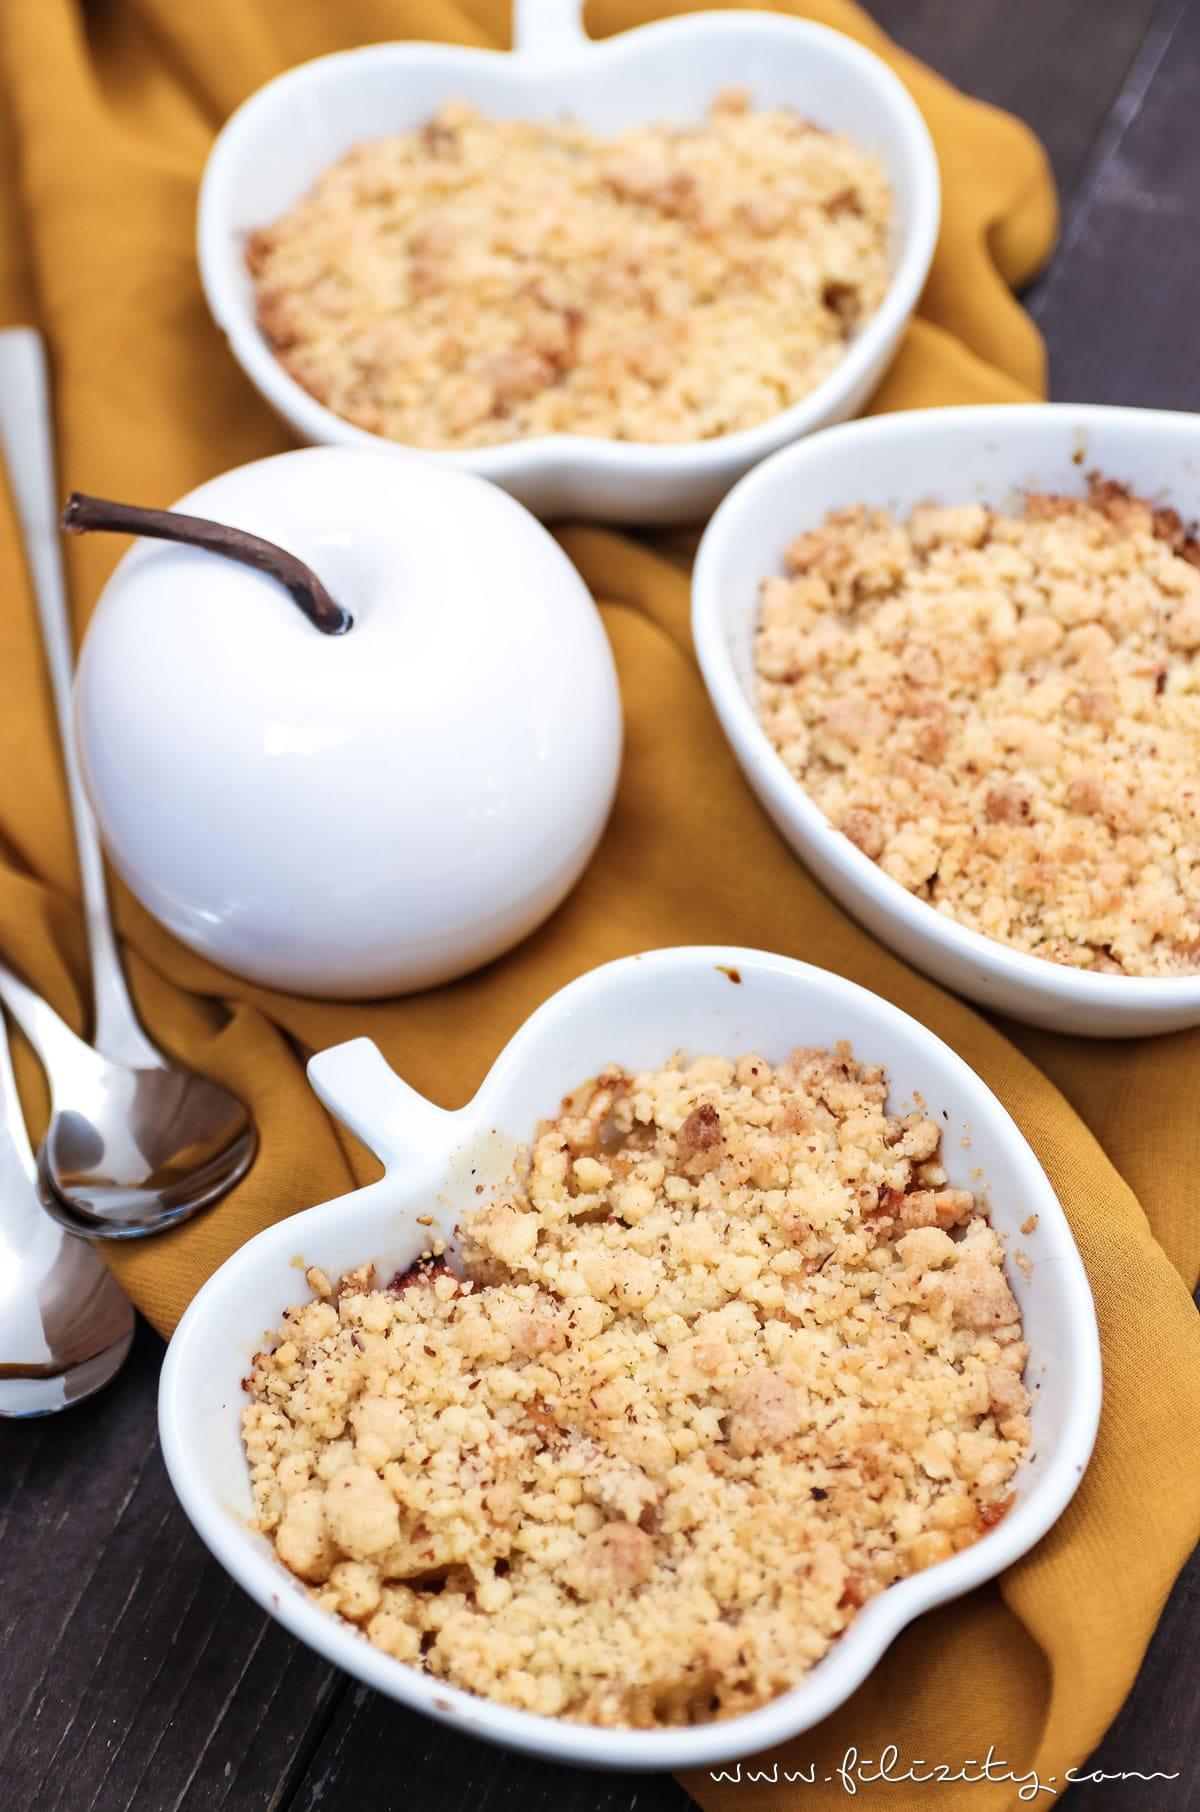 Rezept: Apfel-Quitten-Crumble - Das perfekte Herbst-Dessert | Filizity.com | Food-Blog aus dem Rheinland #crumble #herbst #apfel #quitten